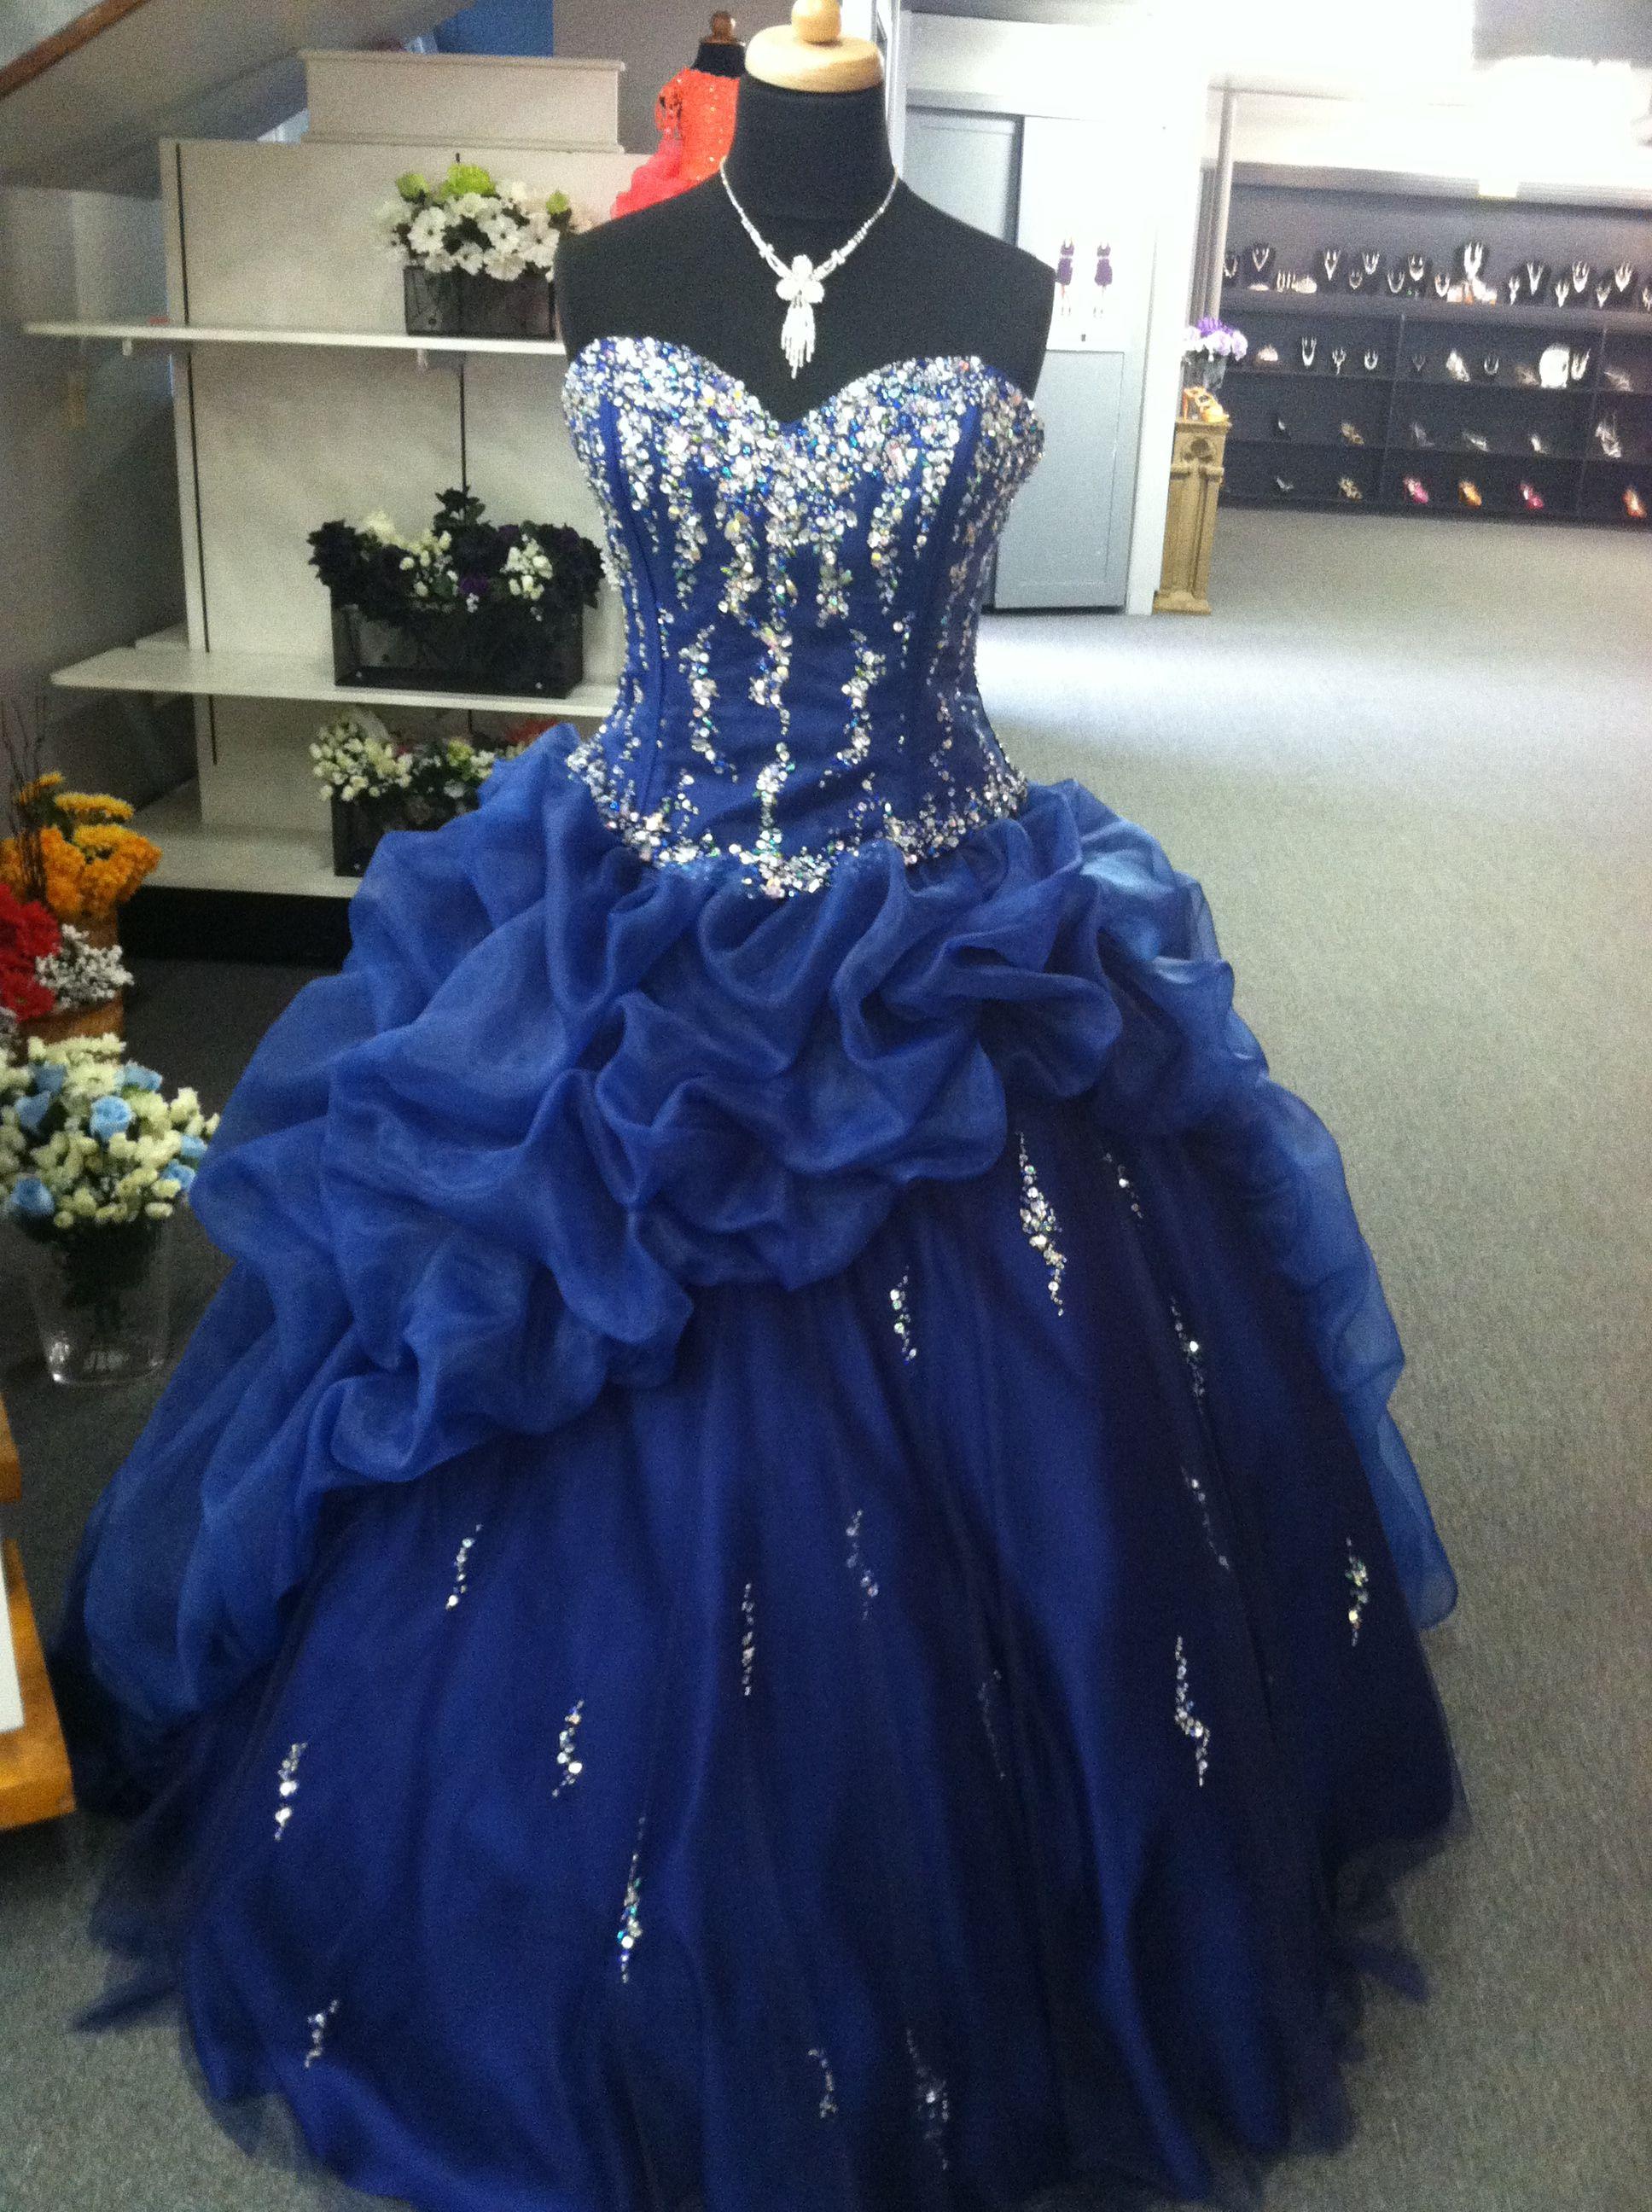 bc522651b2aa1 Midnight Blue Quinceanera dress by DaVinci traditional ruffle skirt ...